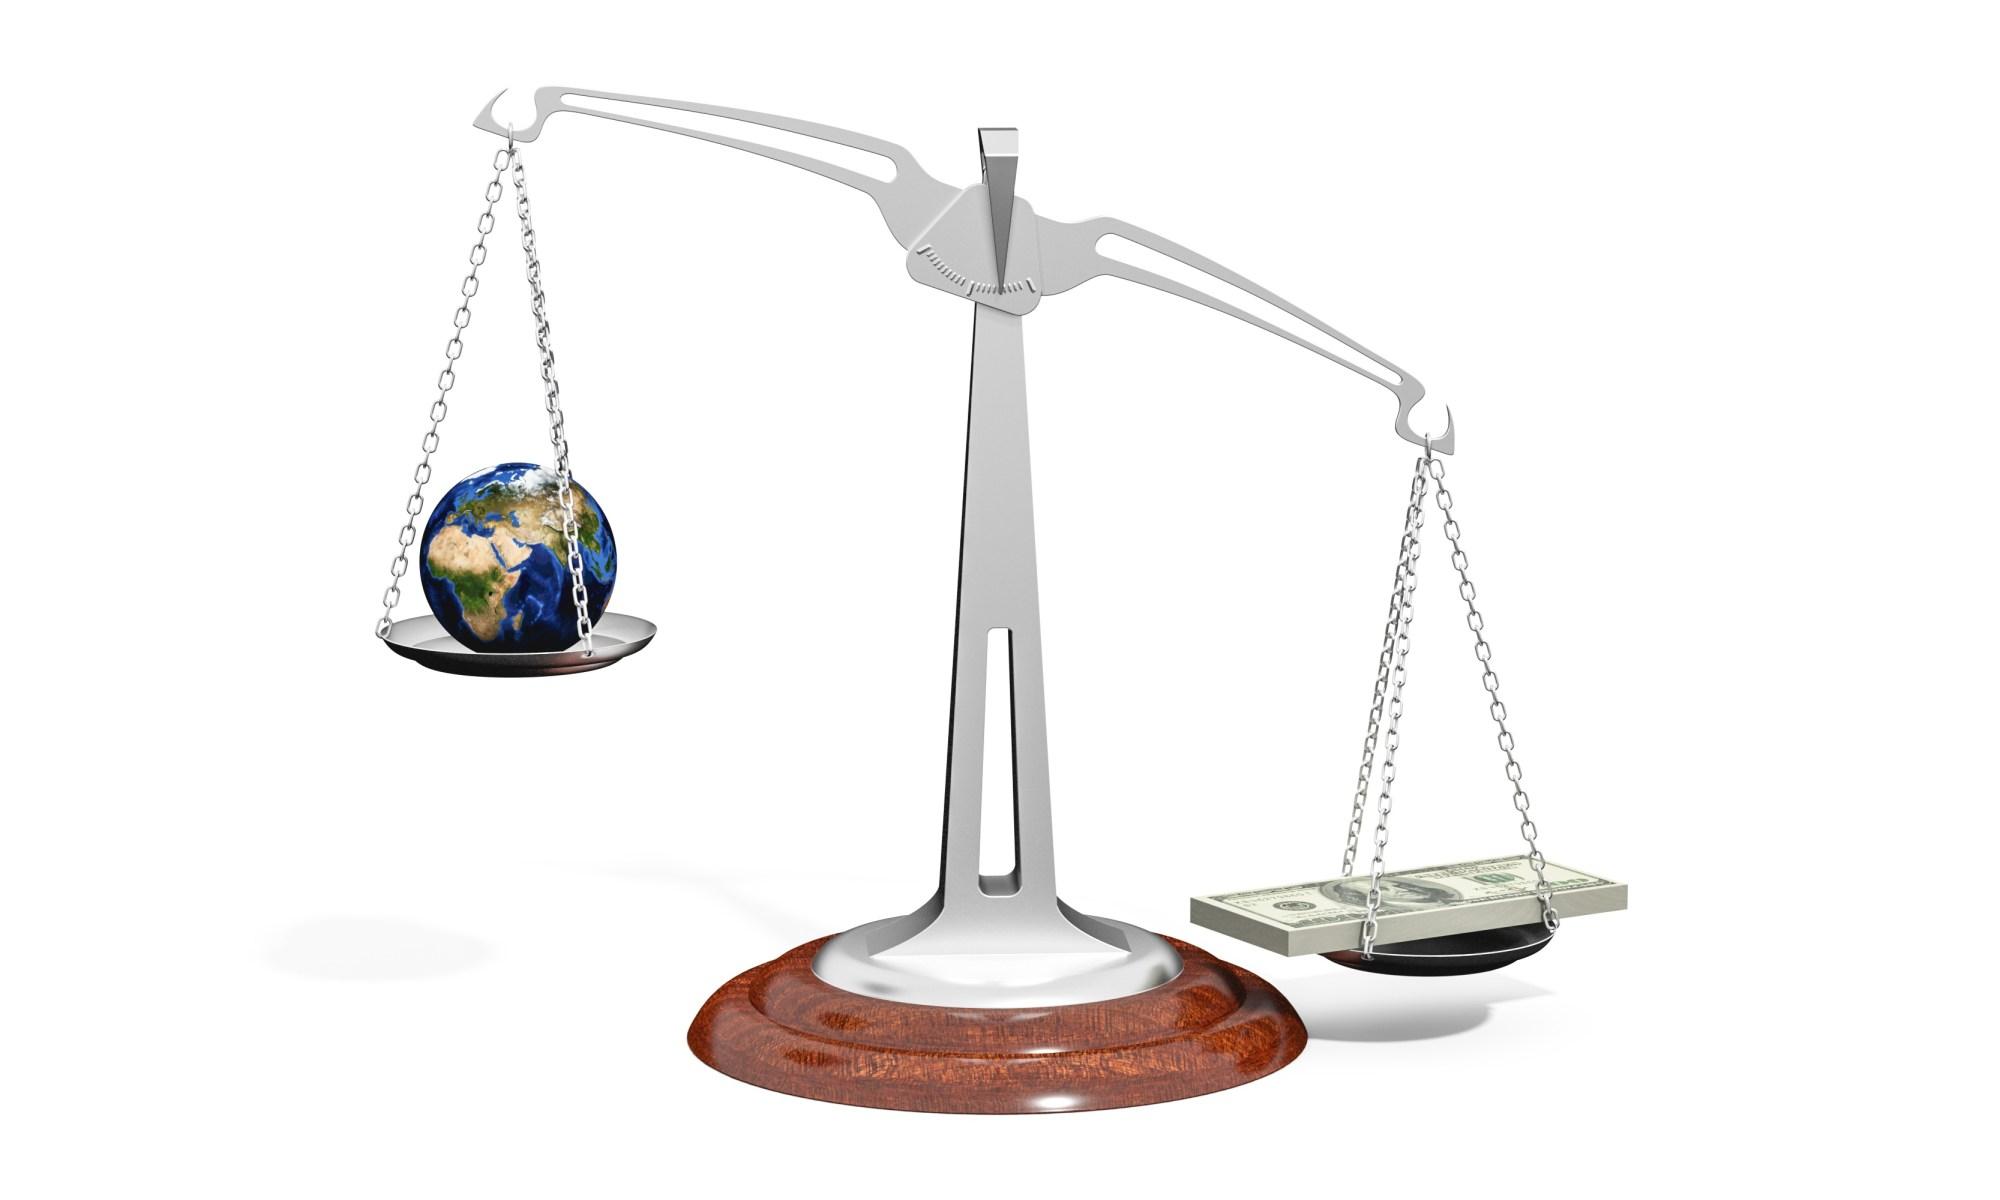 Giving vs Savings